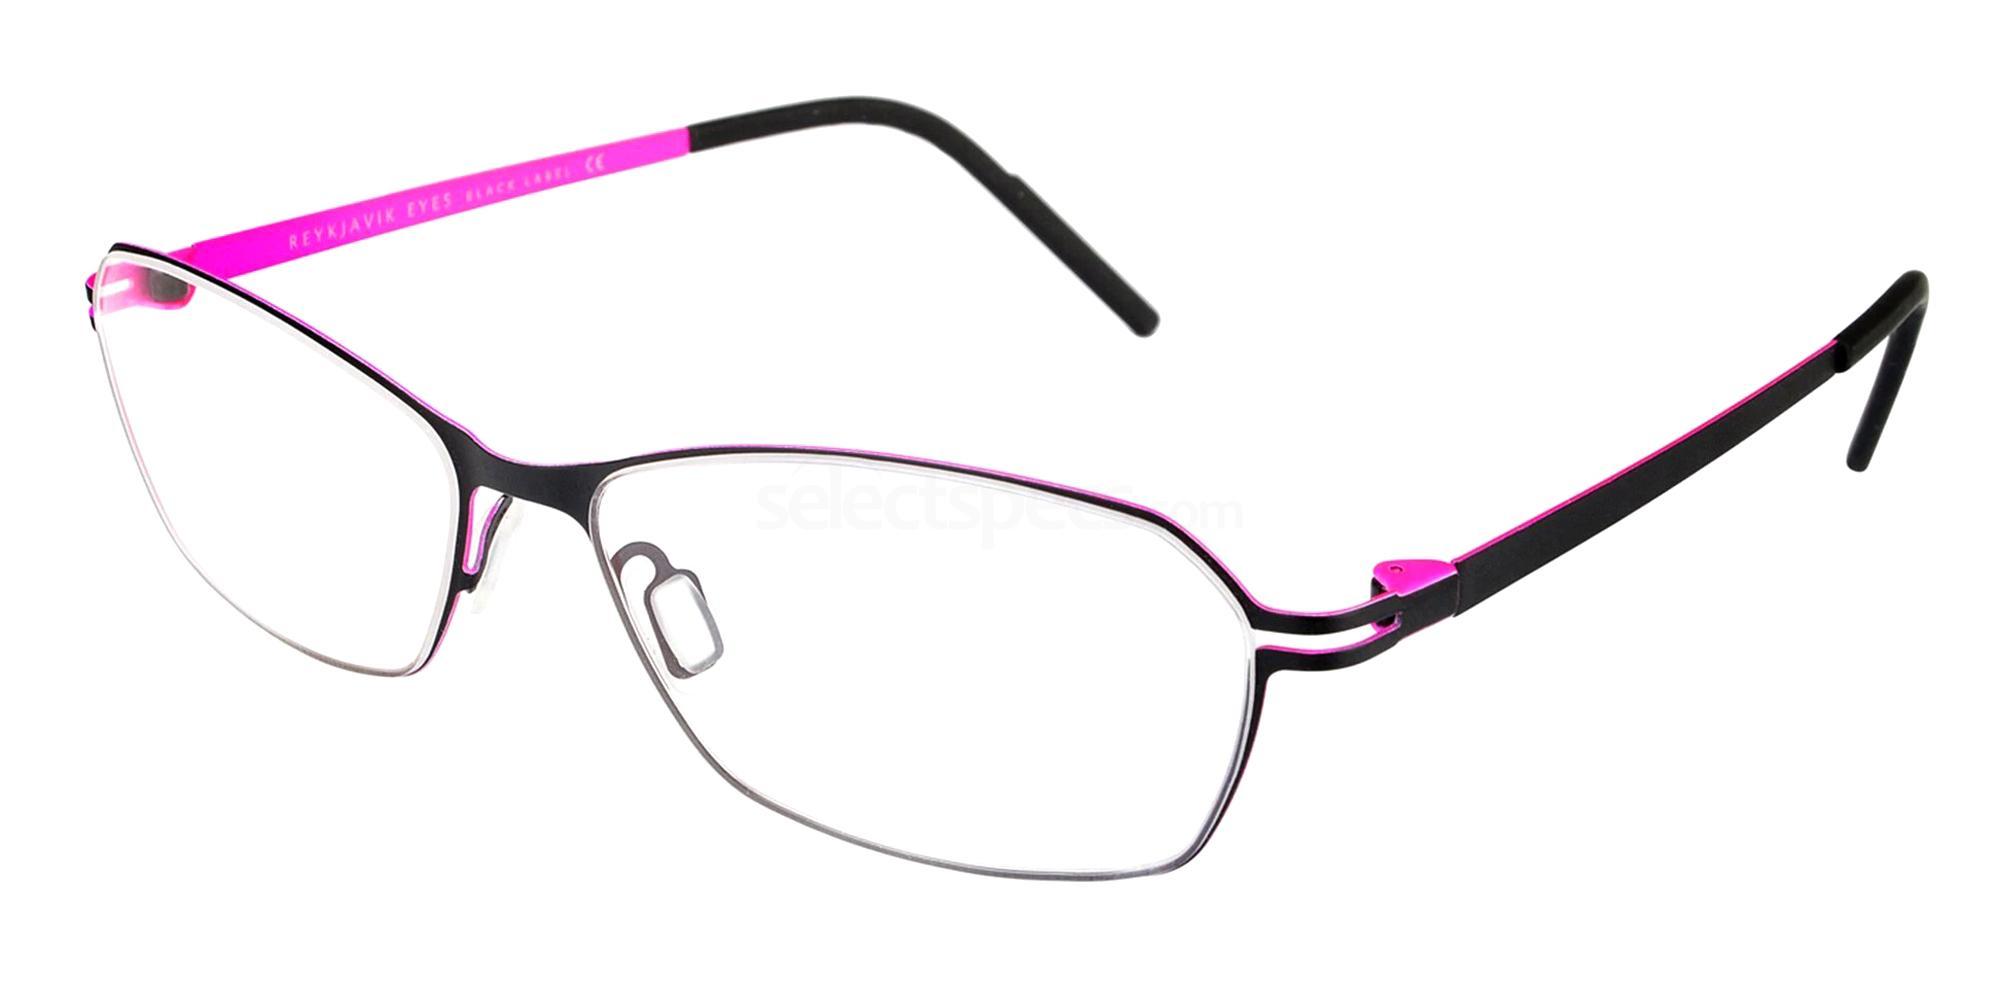 C2 SIF Glasses, Reykjavik Eyes Black Label